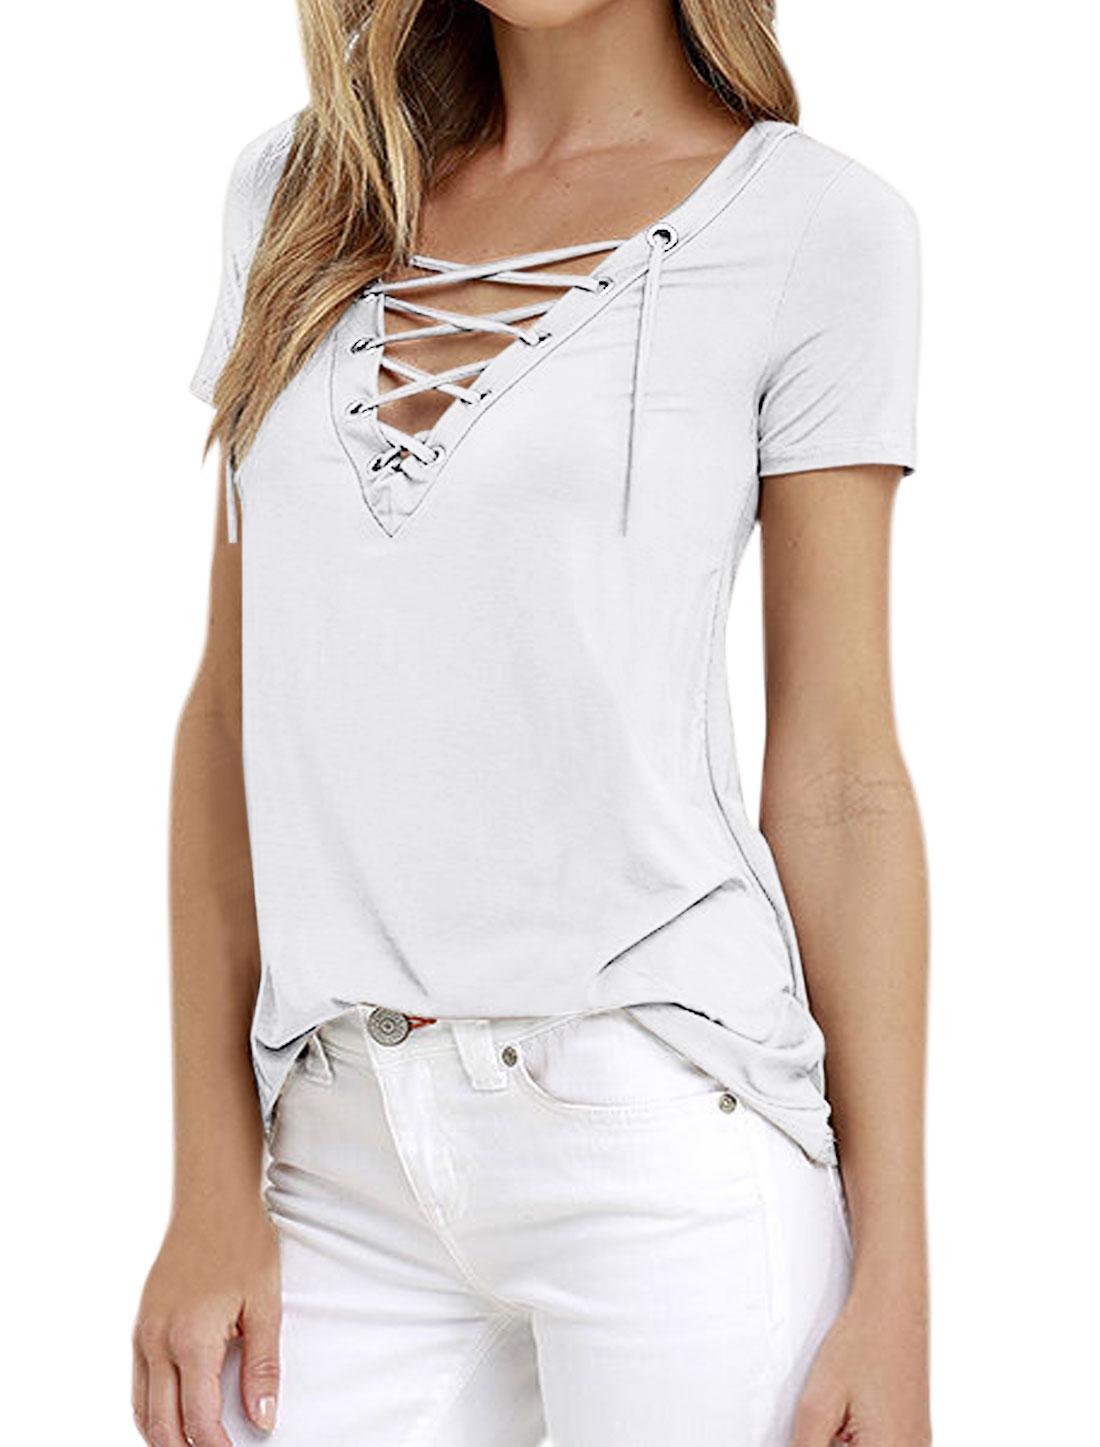 Women Eyelet Design Lace Up Front V Neck Stretchy Tee Shirt White M